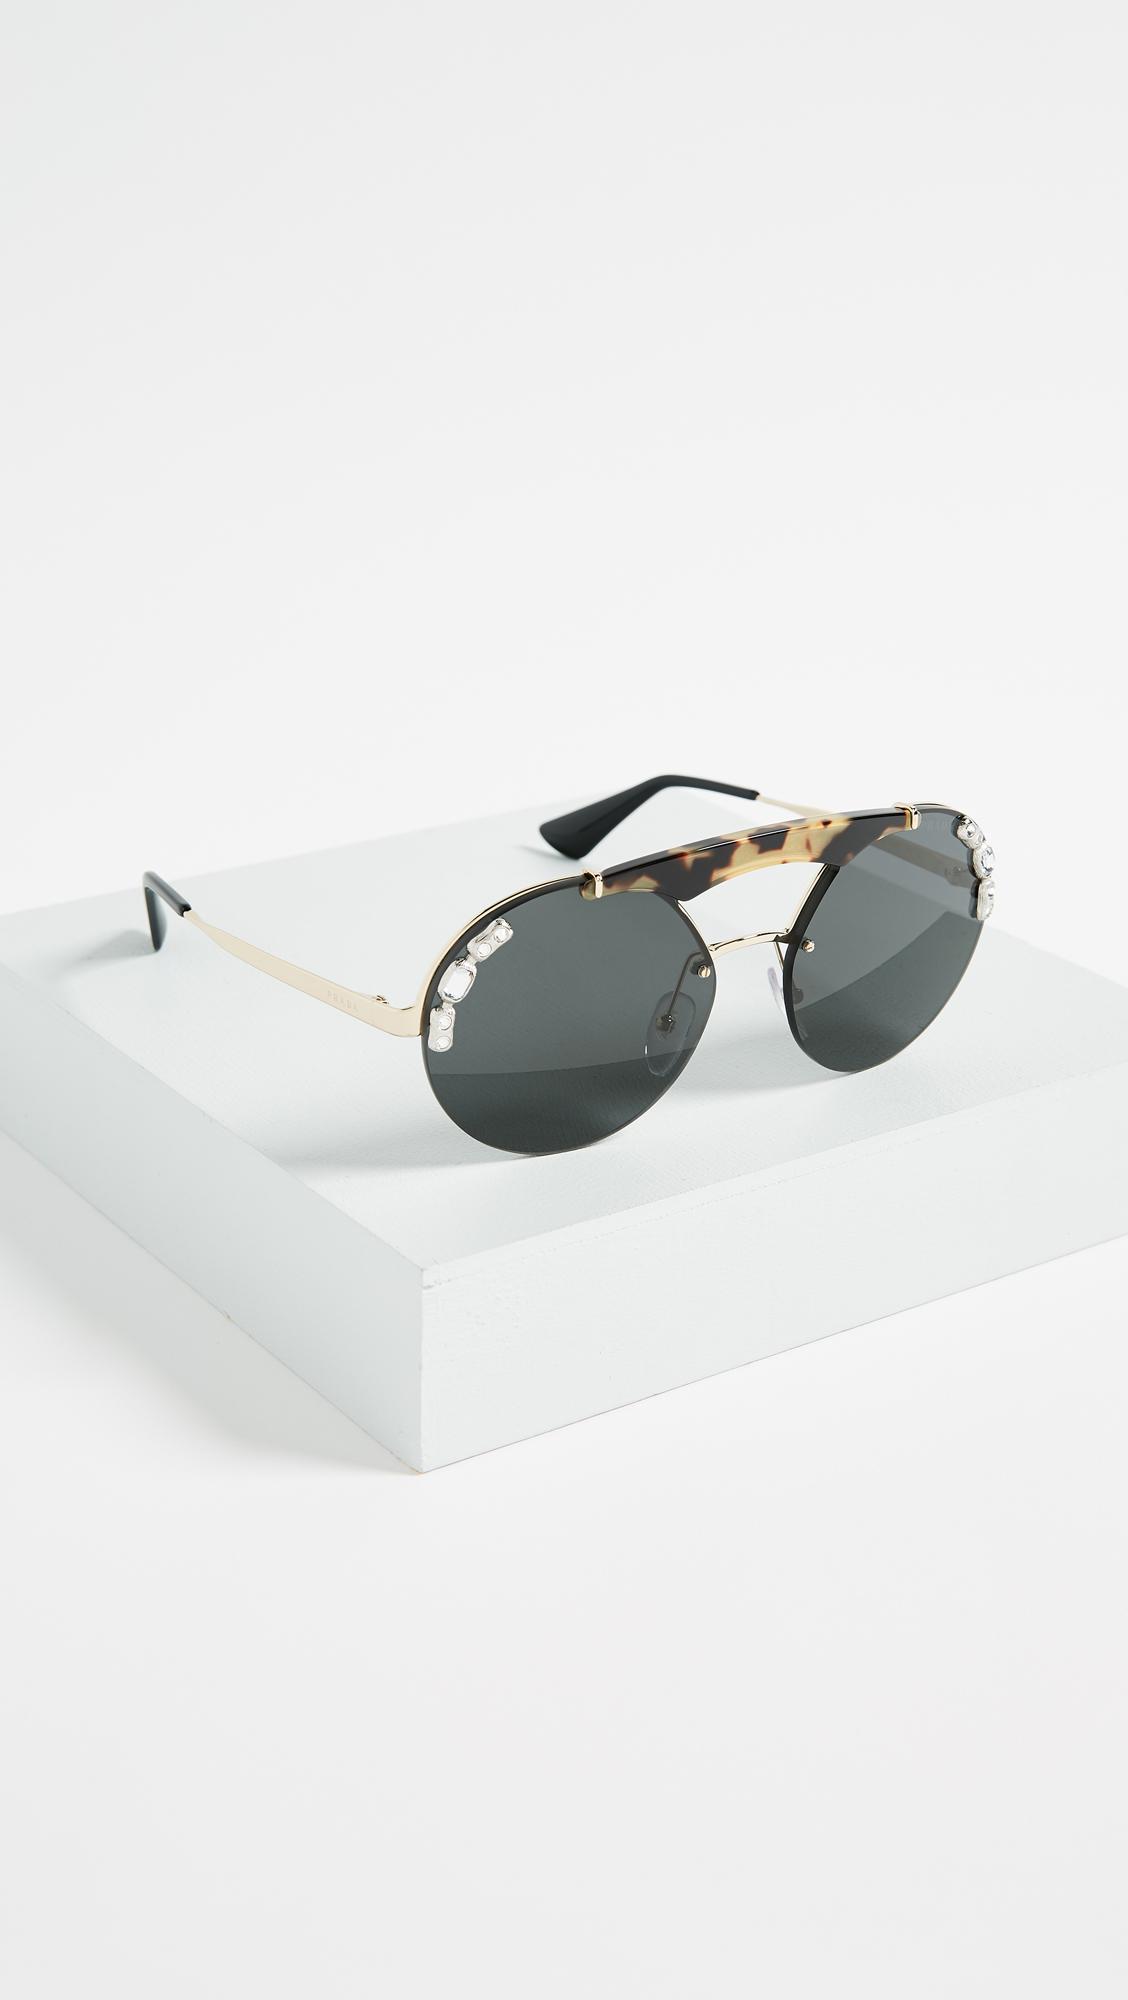 9e59c157f0 Prada Ornate Crystal Round Sunglasses